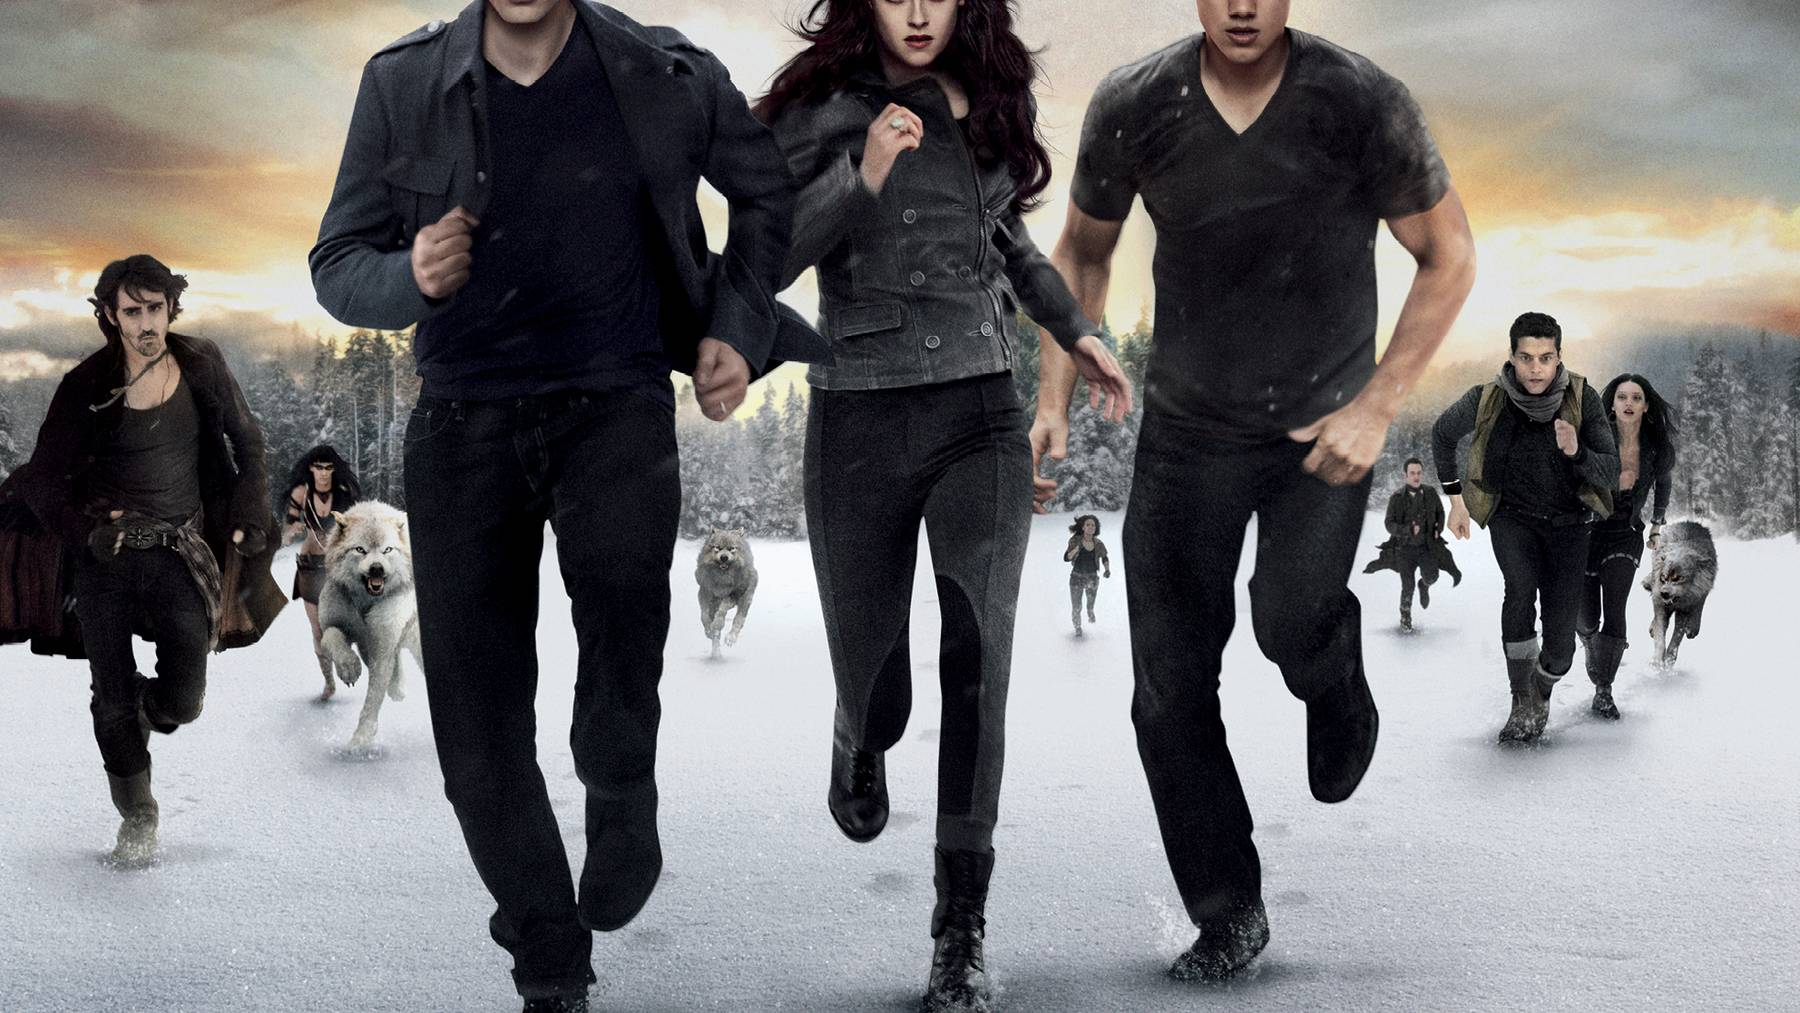 Kinotipp: The Twilight Saga - Breaking Dawn Part 2